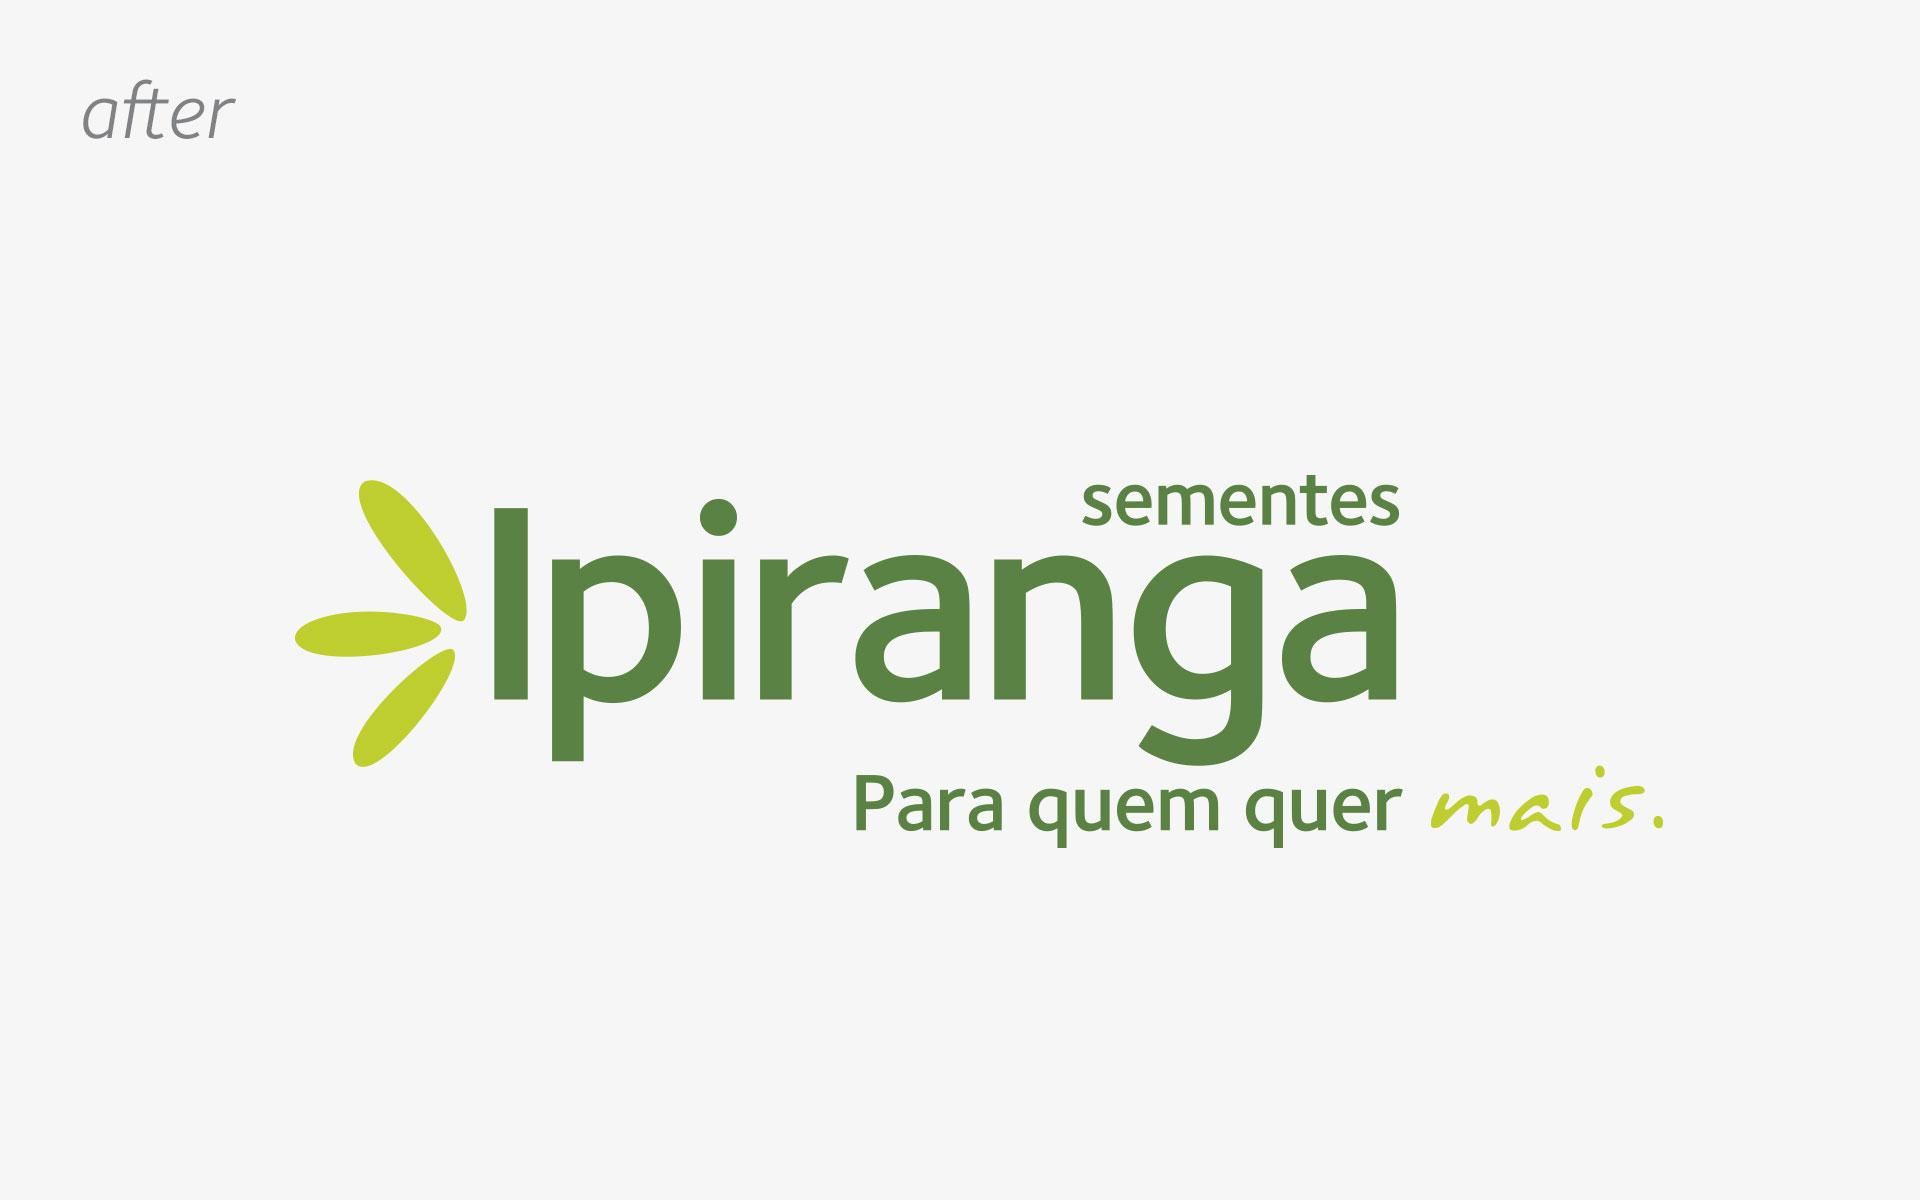 Case Sementes Ipiranga Imagem 2